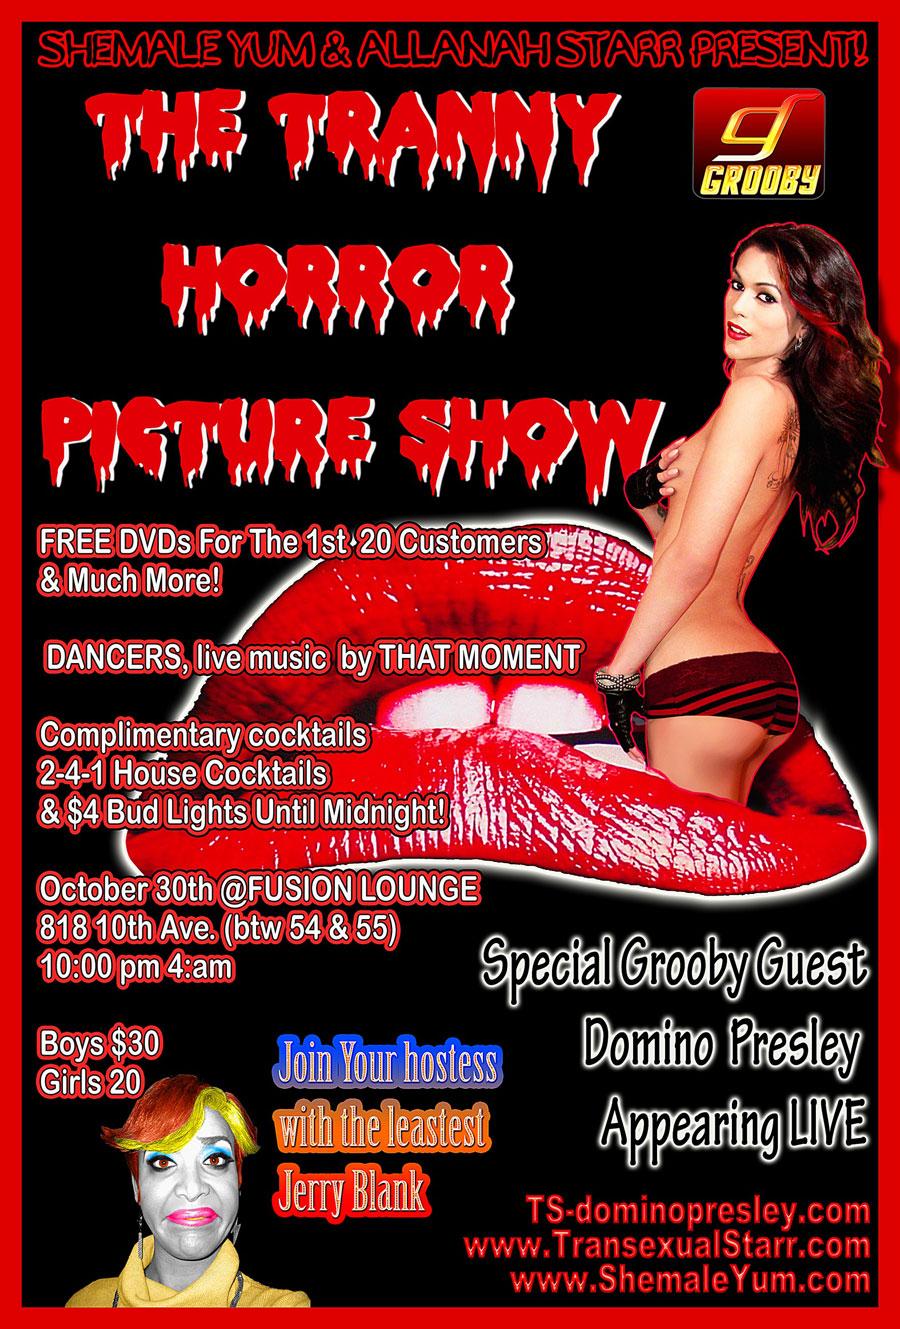 Nude peep shows and dayton ohio